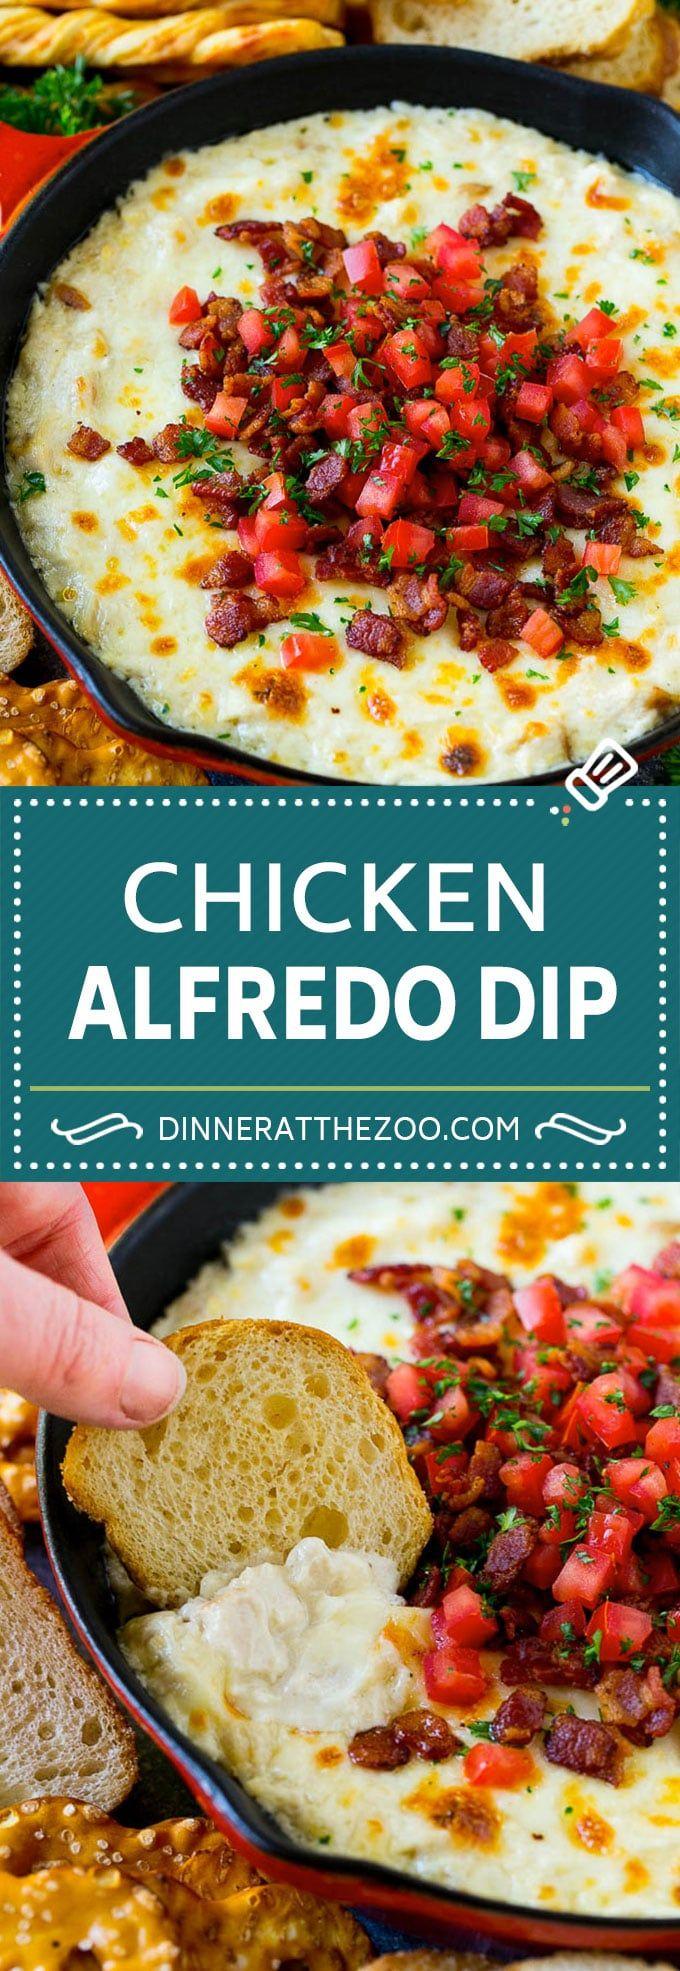 Chicken Alfredo Dip #chickenalfredo